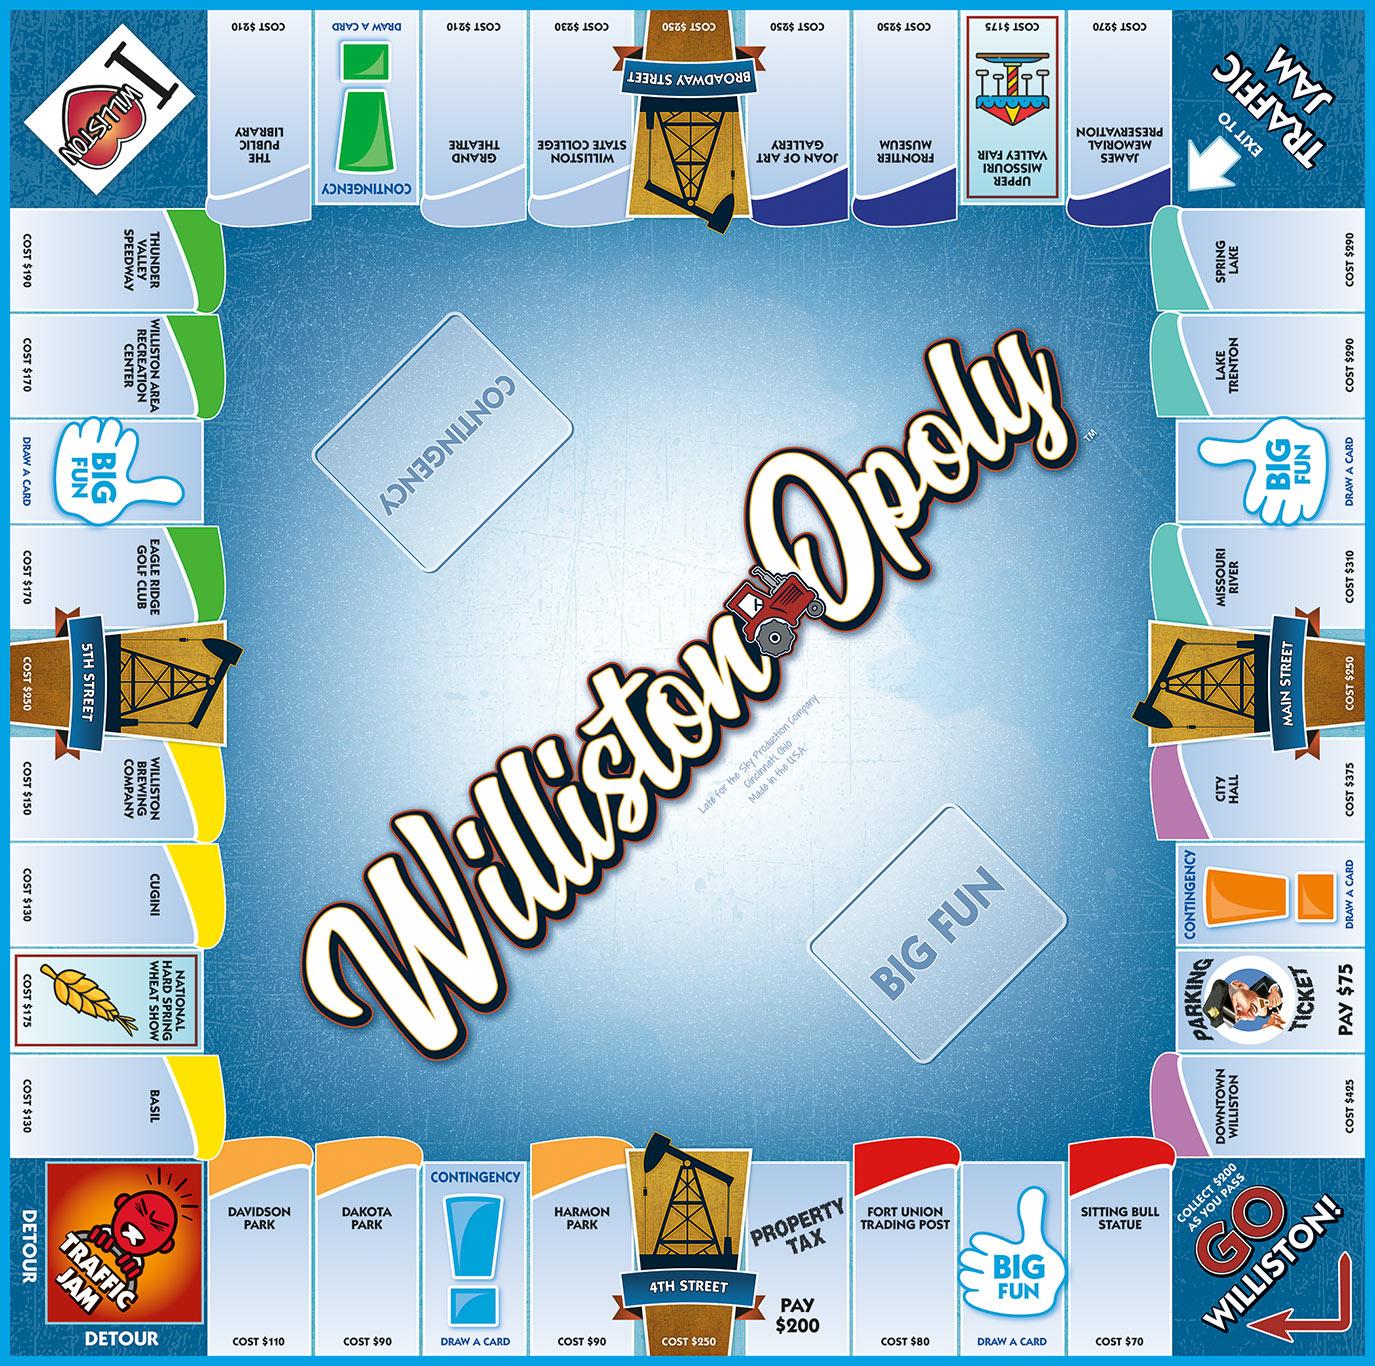 WILLISTON-OPOLY Board Game